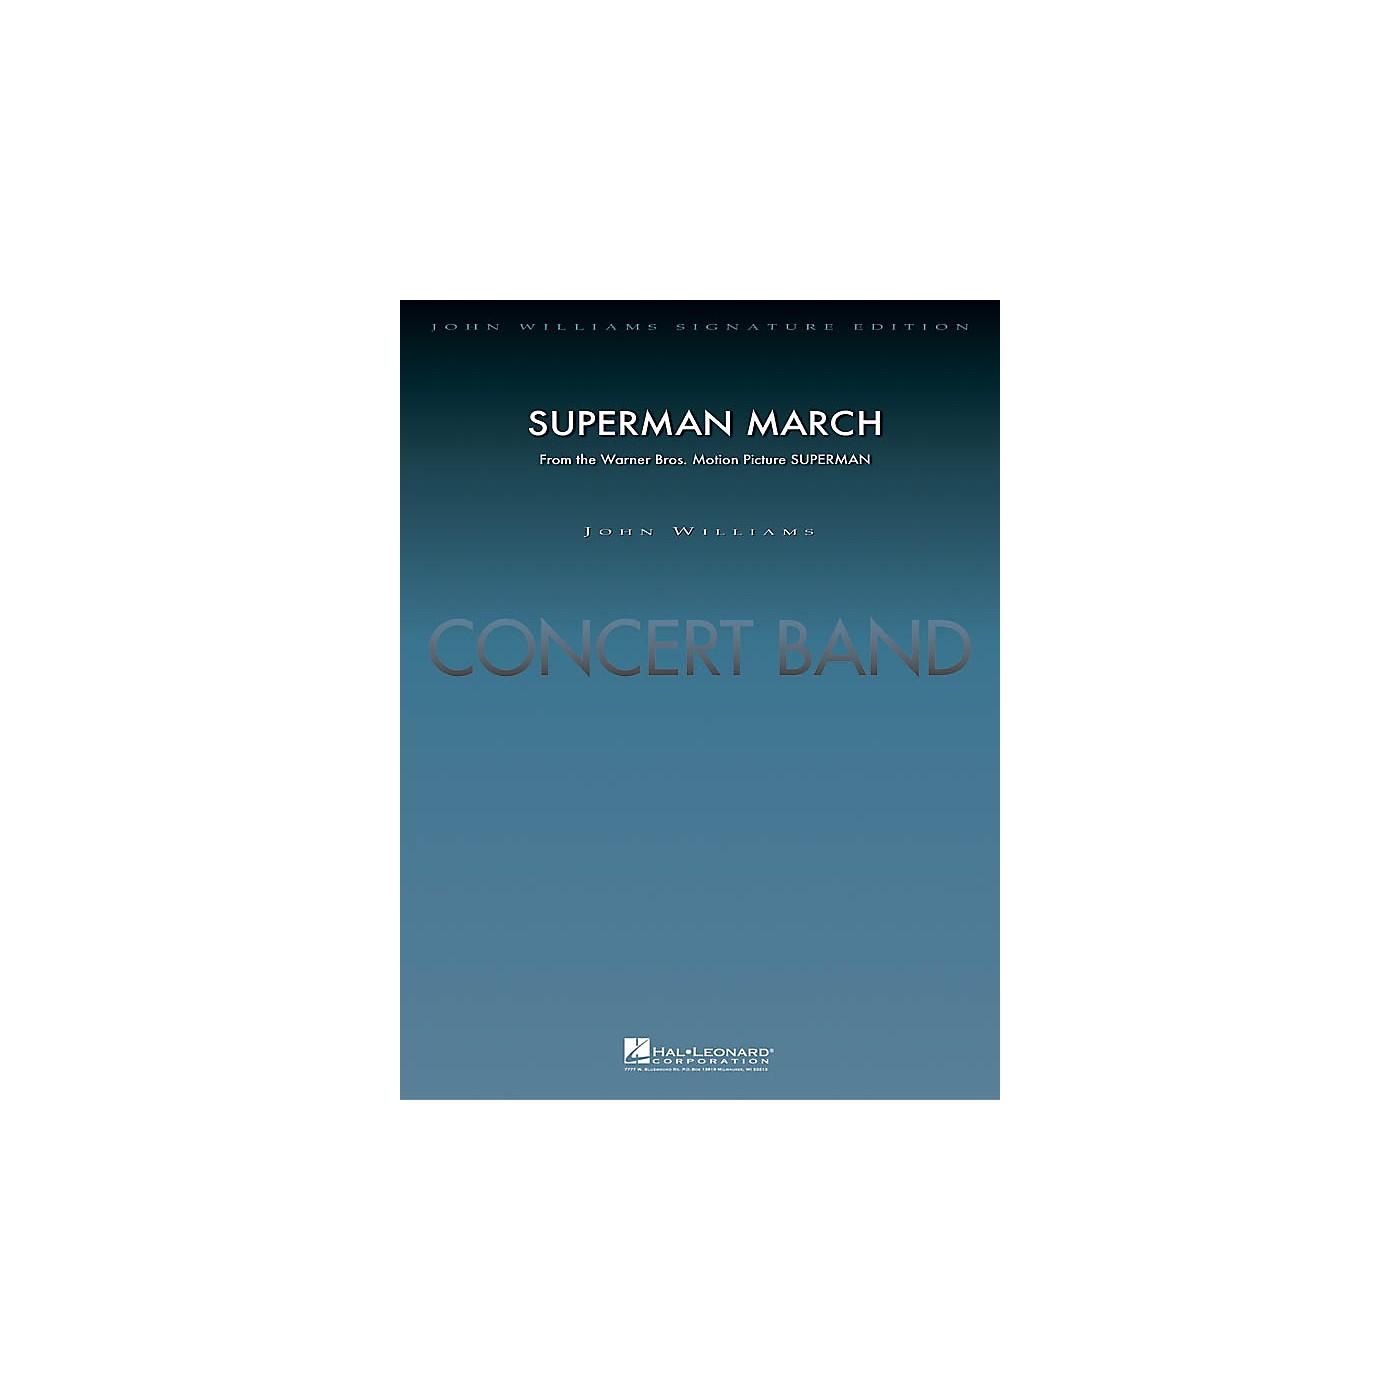 Hal Leonard Superman March (Deluxe Score) Concert Band Level 5 Arranged by Paul Lavender thumbnail